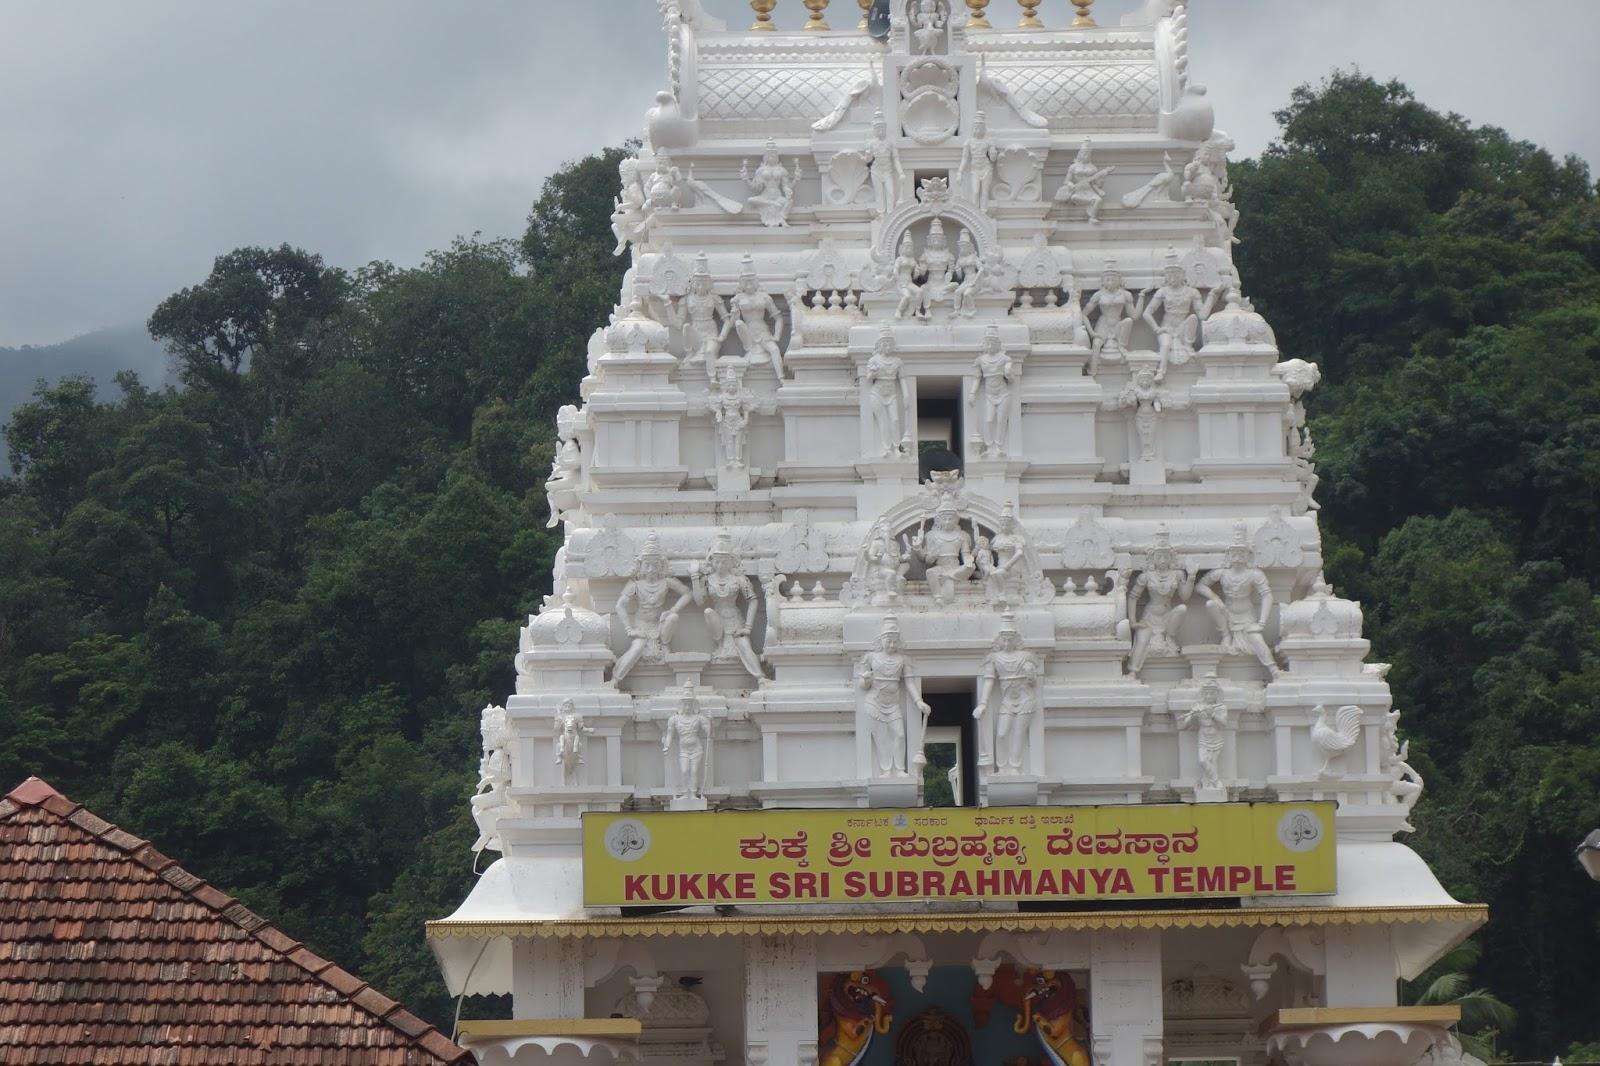 Kukke subramanya swamy temple photos Best